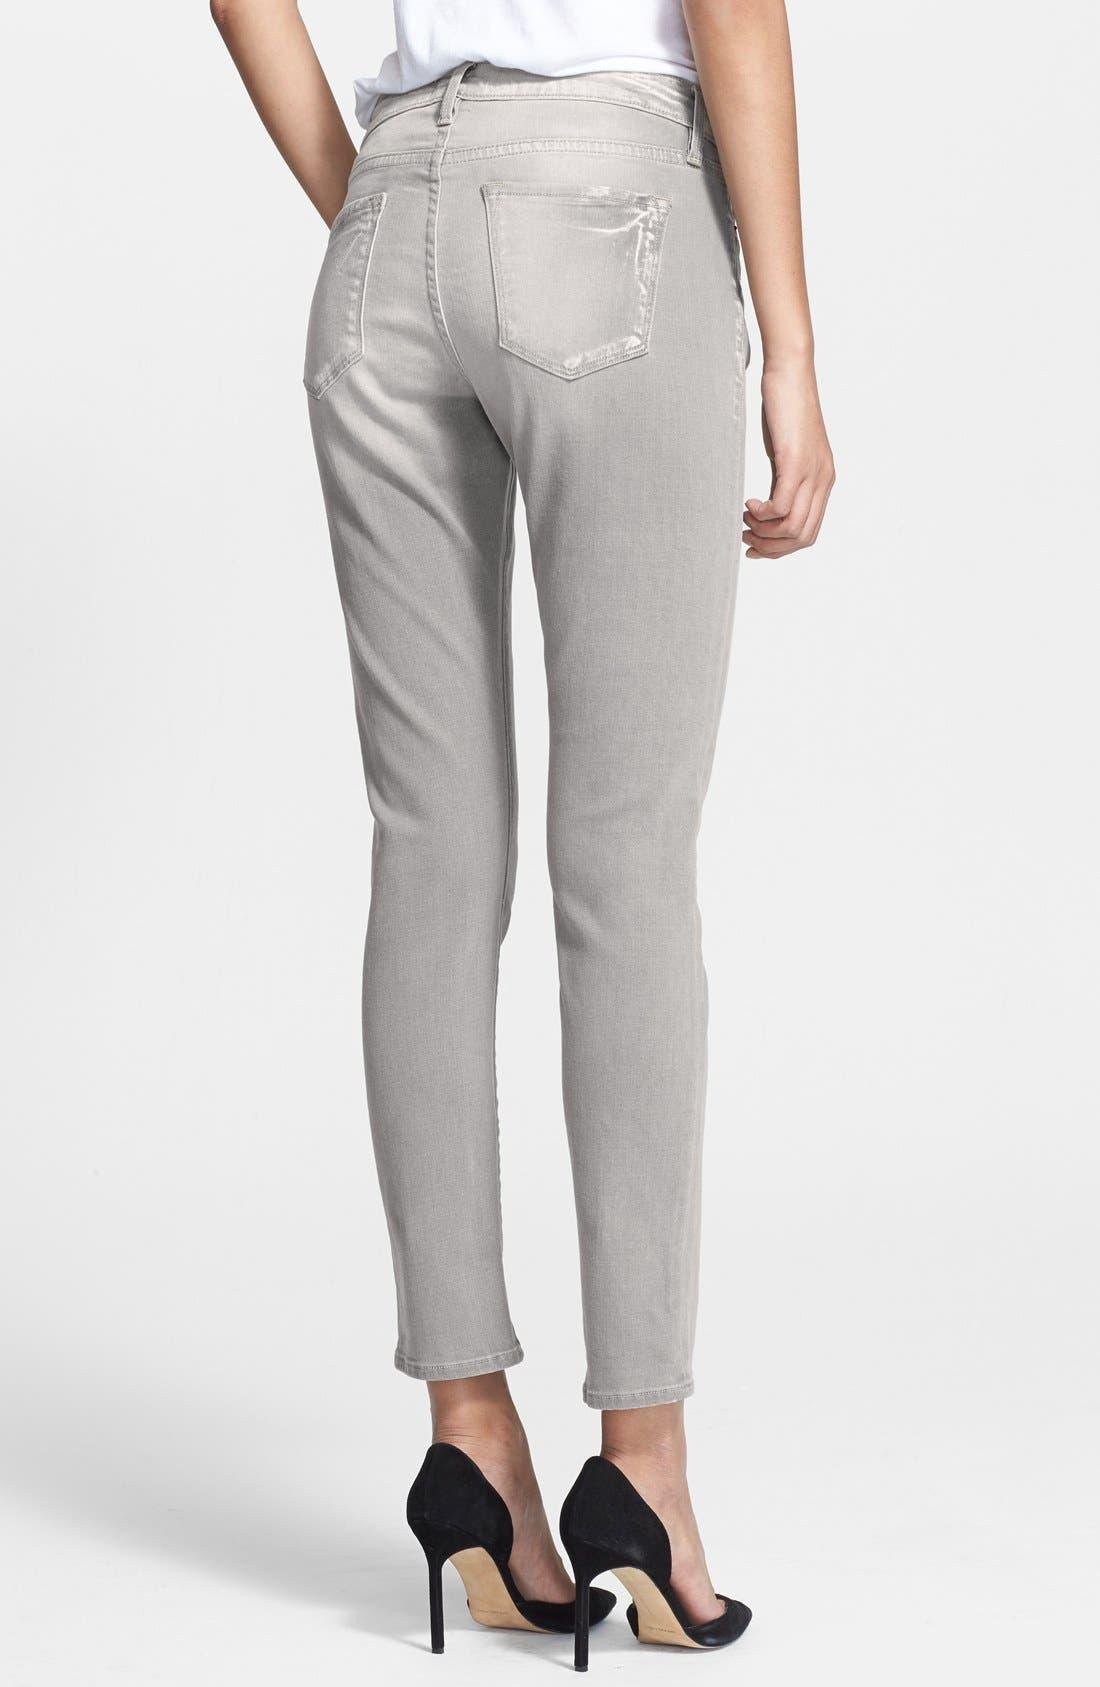 Alternate Image 2  - Frame Denim 'Le Garcon' Slim Boyfriend Jeans (Kensington)